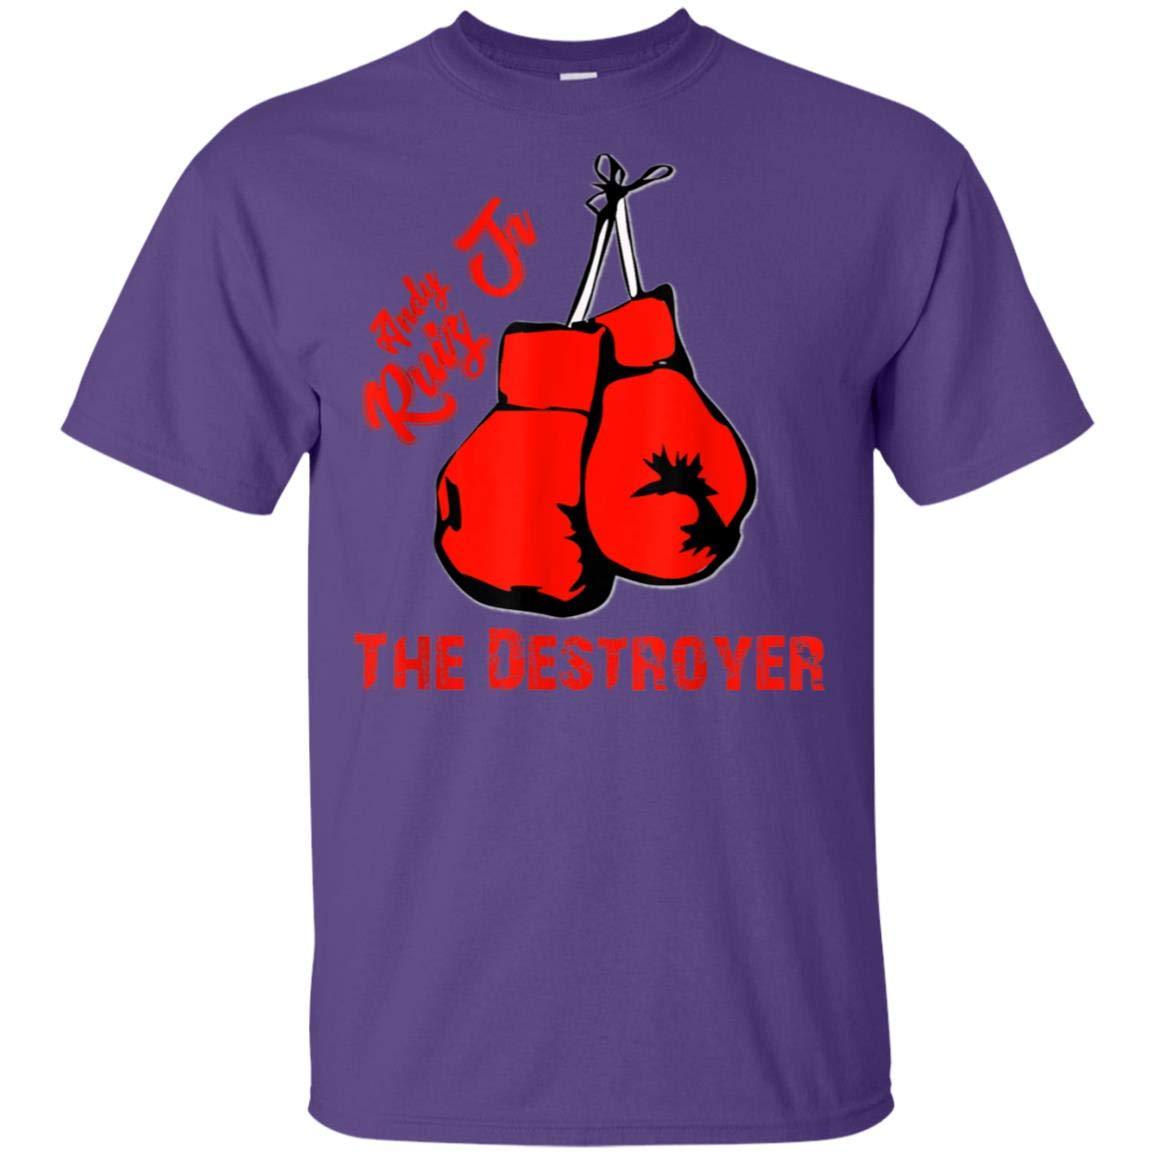 S Andy Ruiz Jr The Destroyer Boxing Tshirt